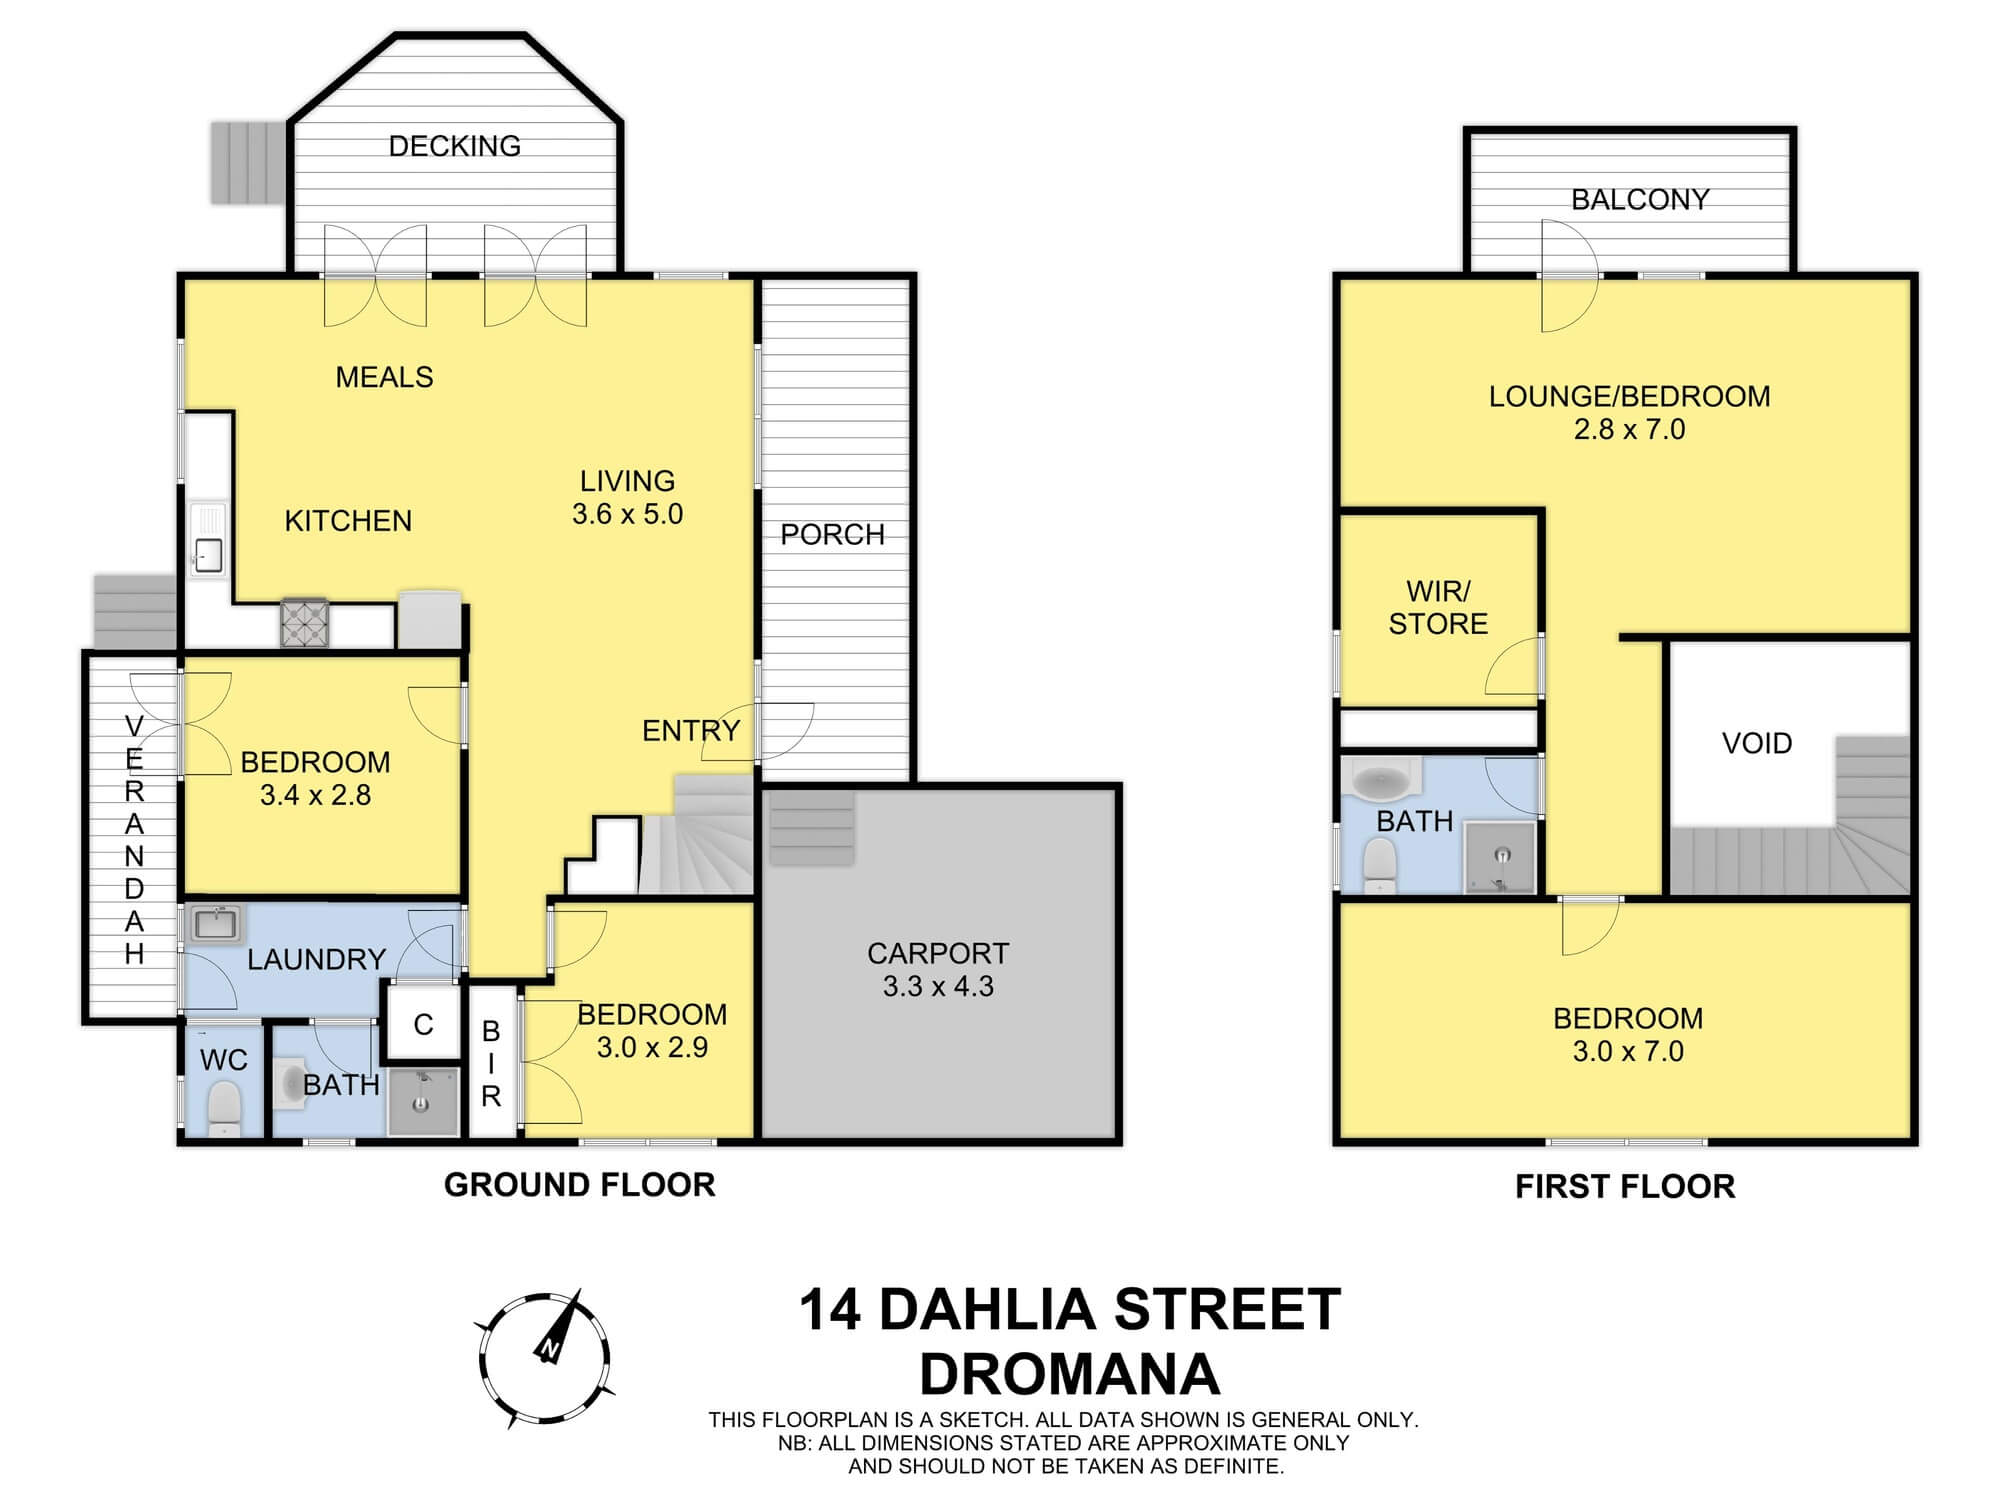 Property For Sale 14 Dahlia Street Dromana VIC 3936 17